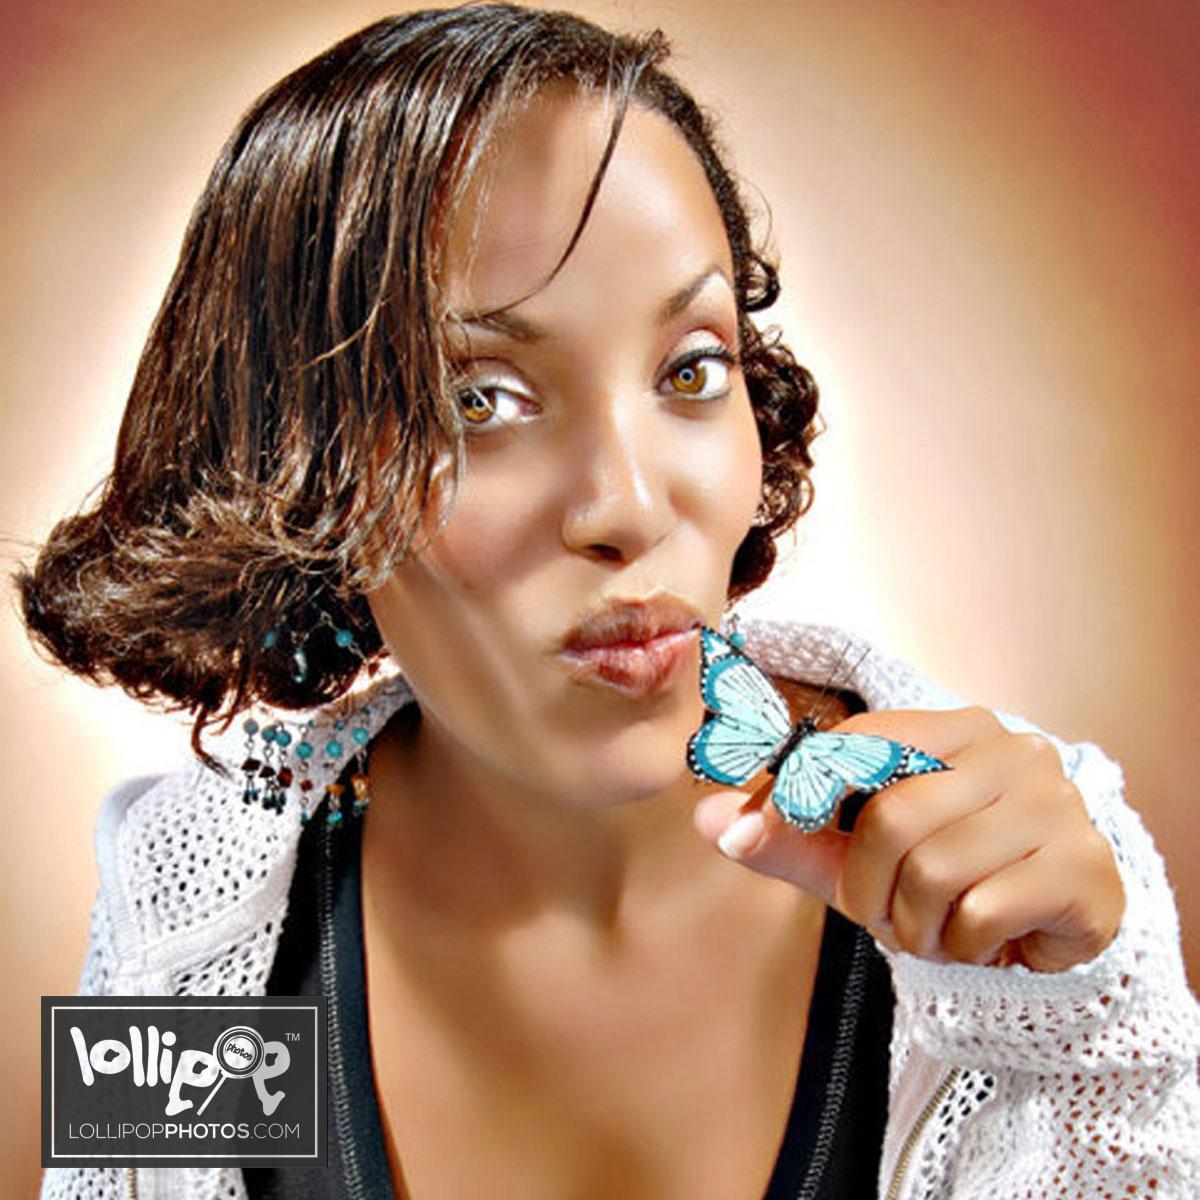 msdig-nora-canfield-lollipop-photos-046.jpg